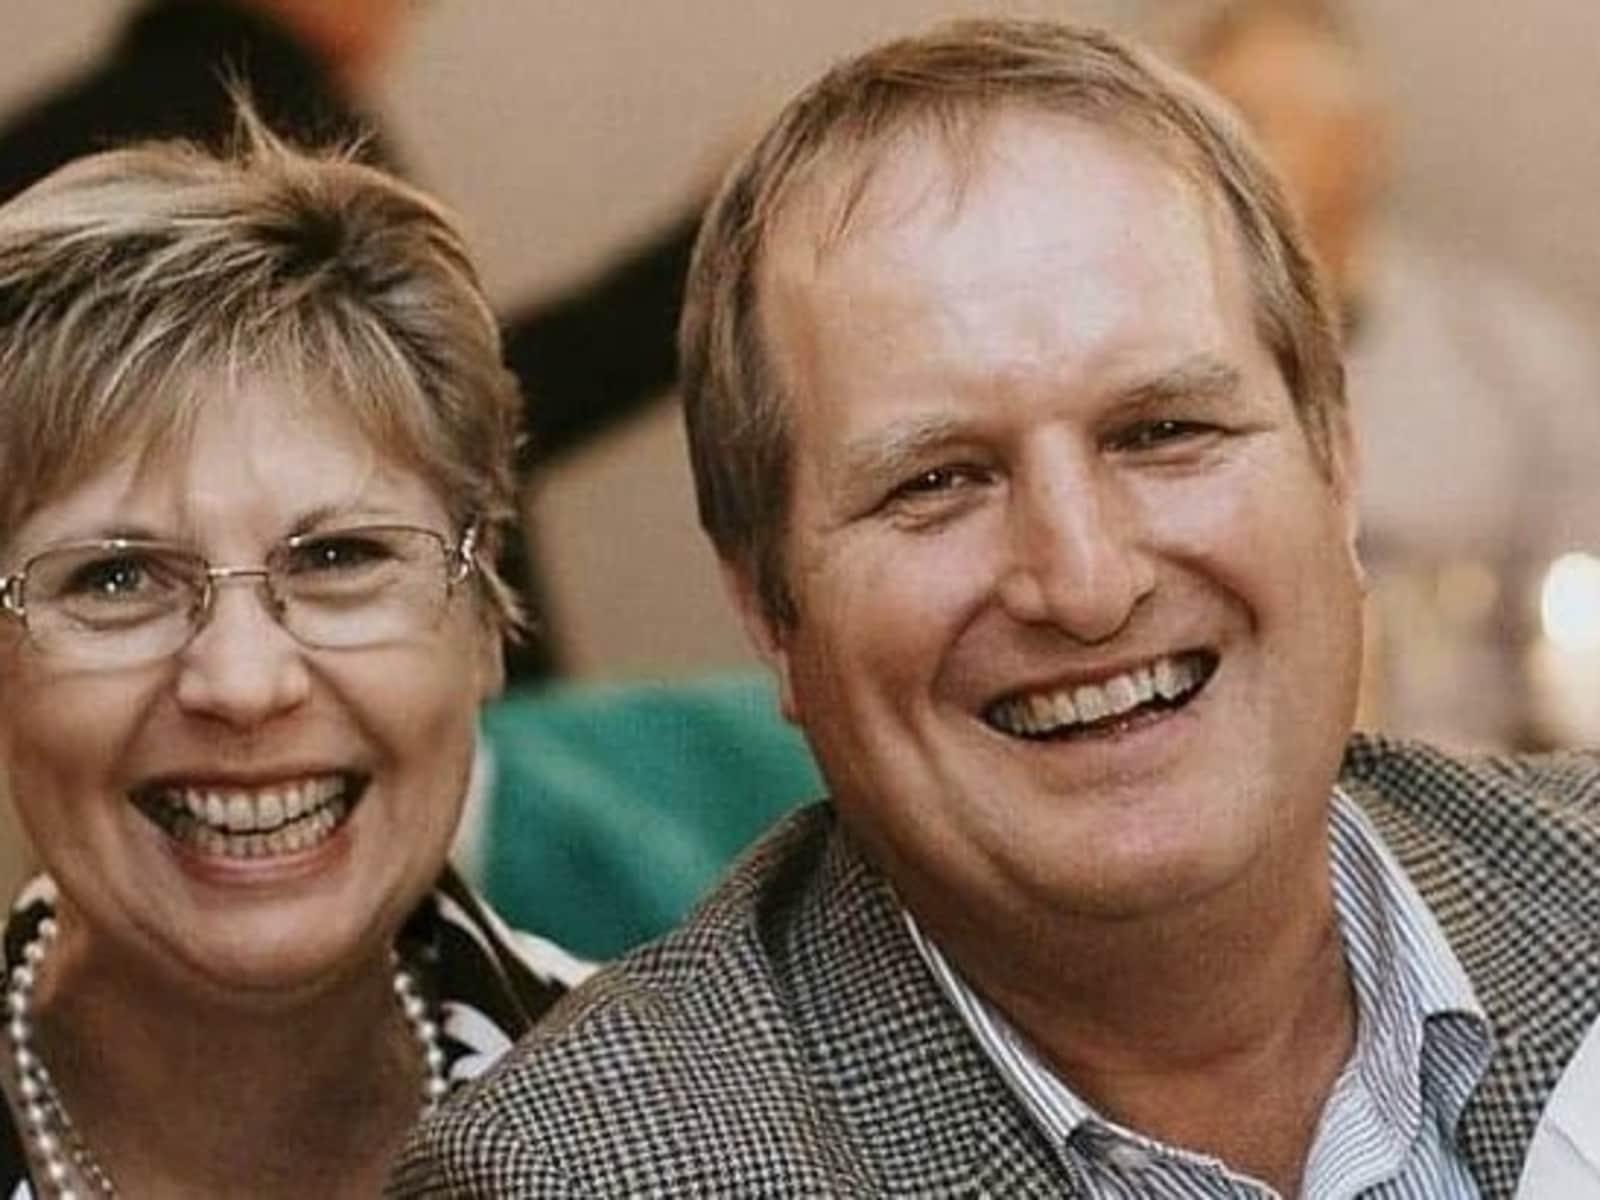 Lynne & Tony from Toowoomba, Queensland, Australia